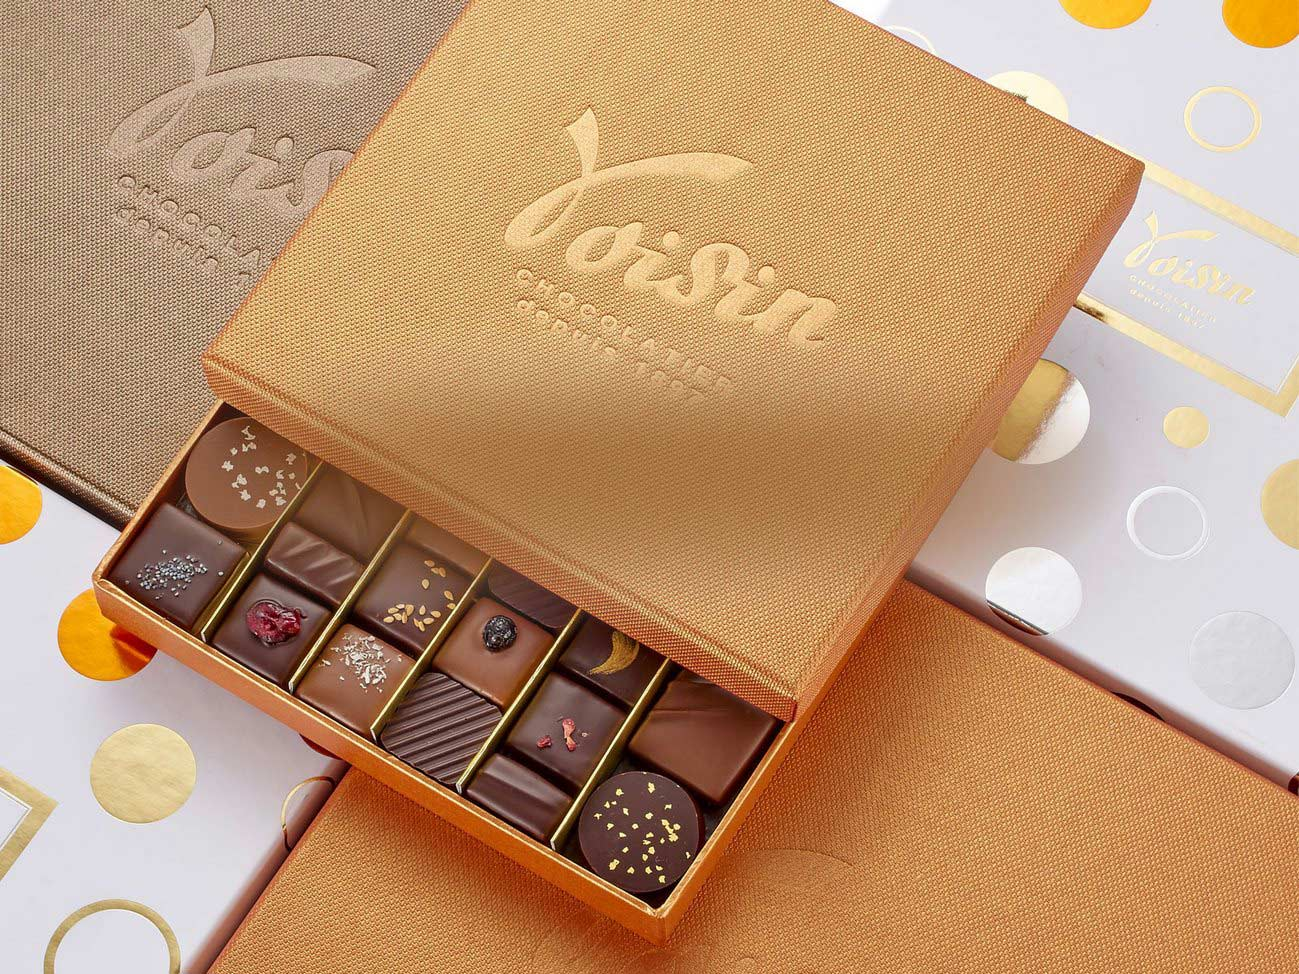 Plusieurs boîtes de chocolats Voisin